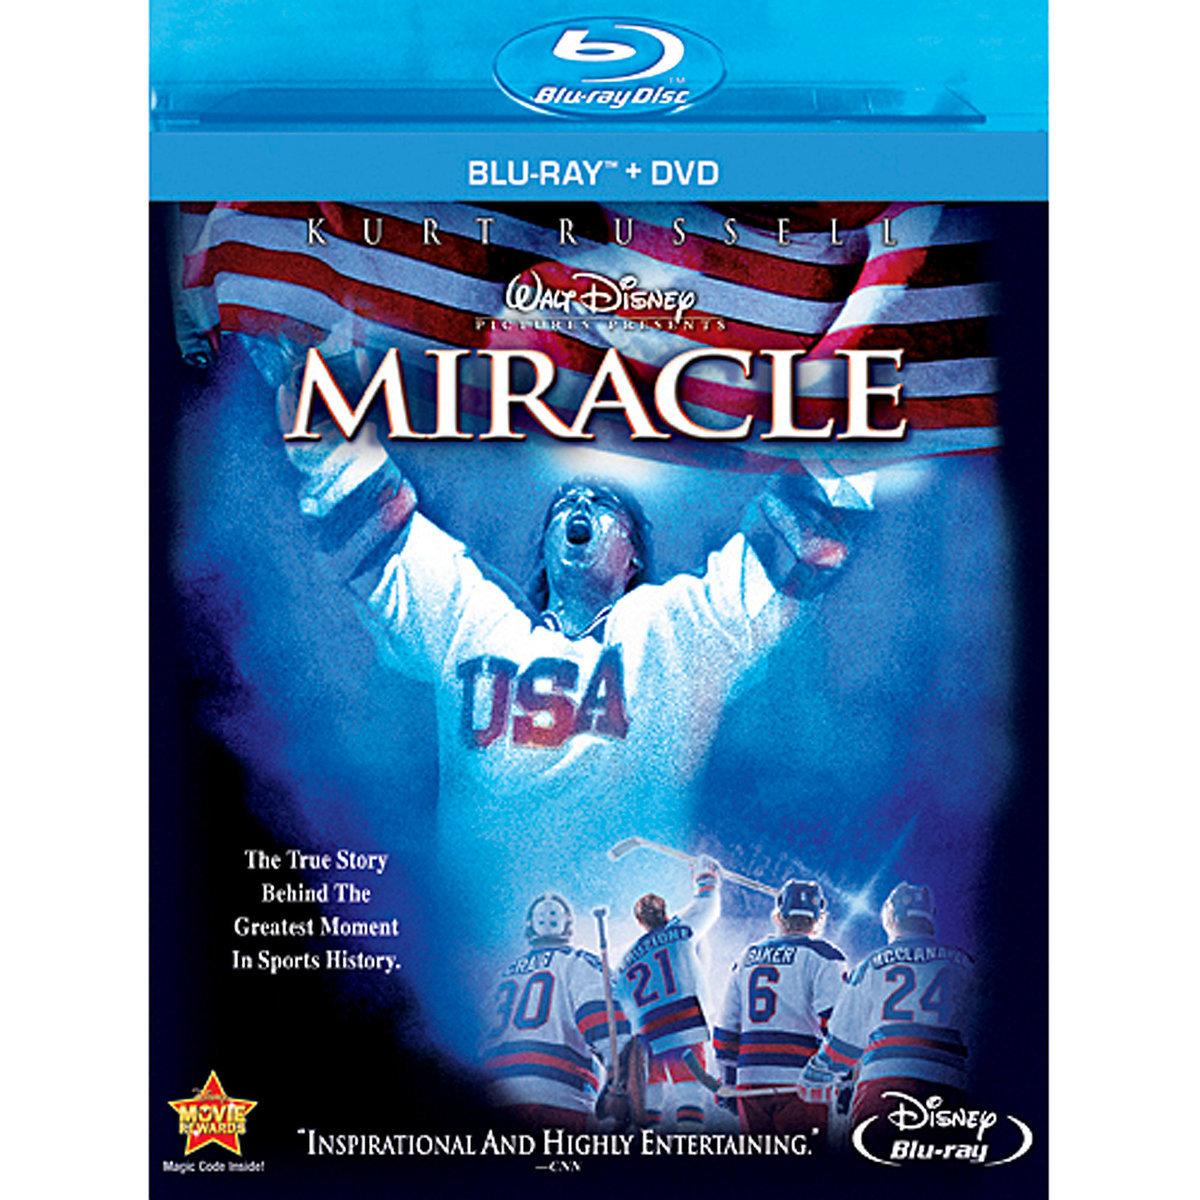 Miracle (Blu-ray + DVD)